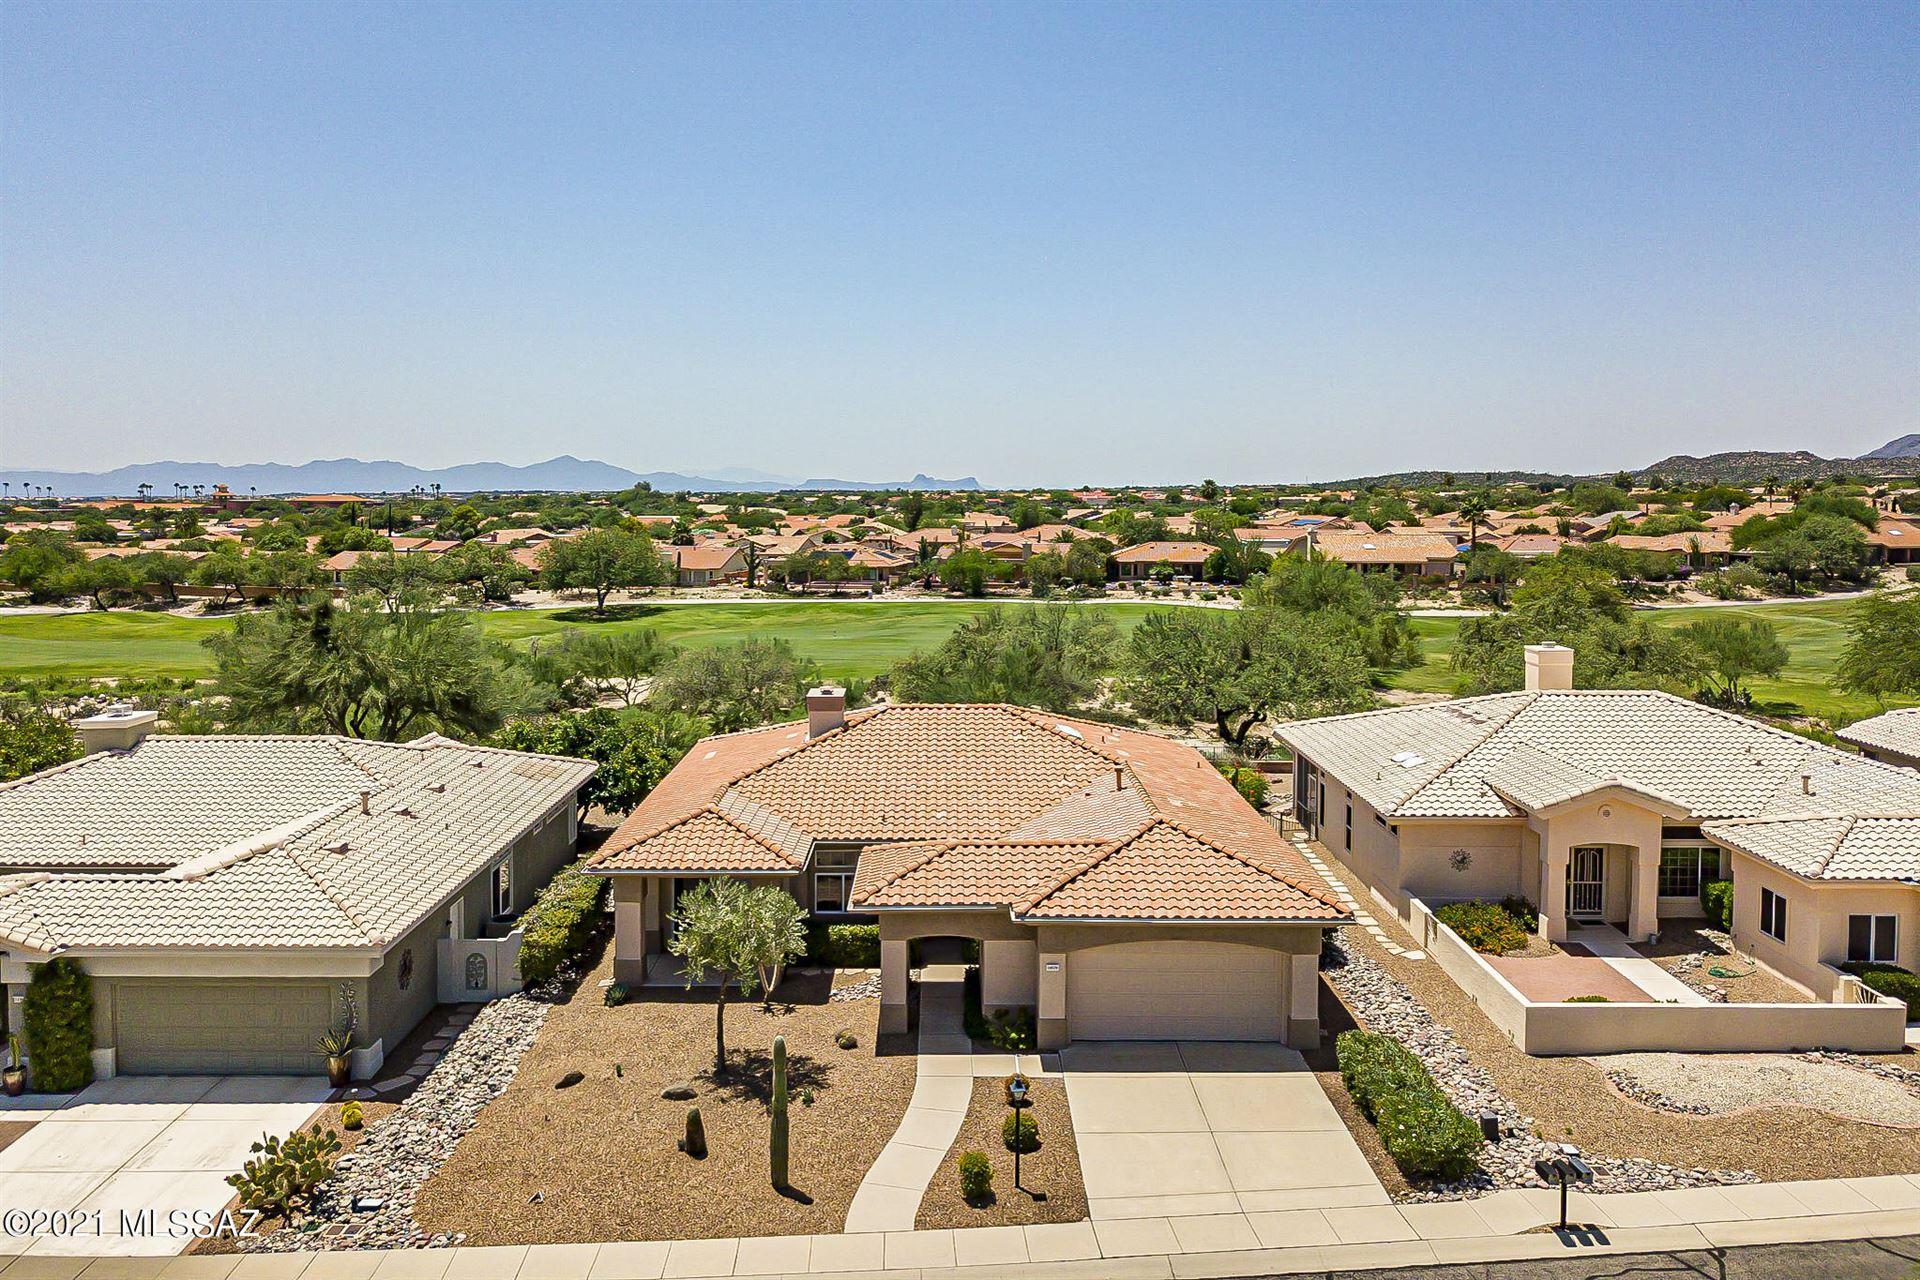 14579 N Lost Arrow Drive, Oro Valley, AZ 85755 - MLS#: 22120195